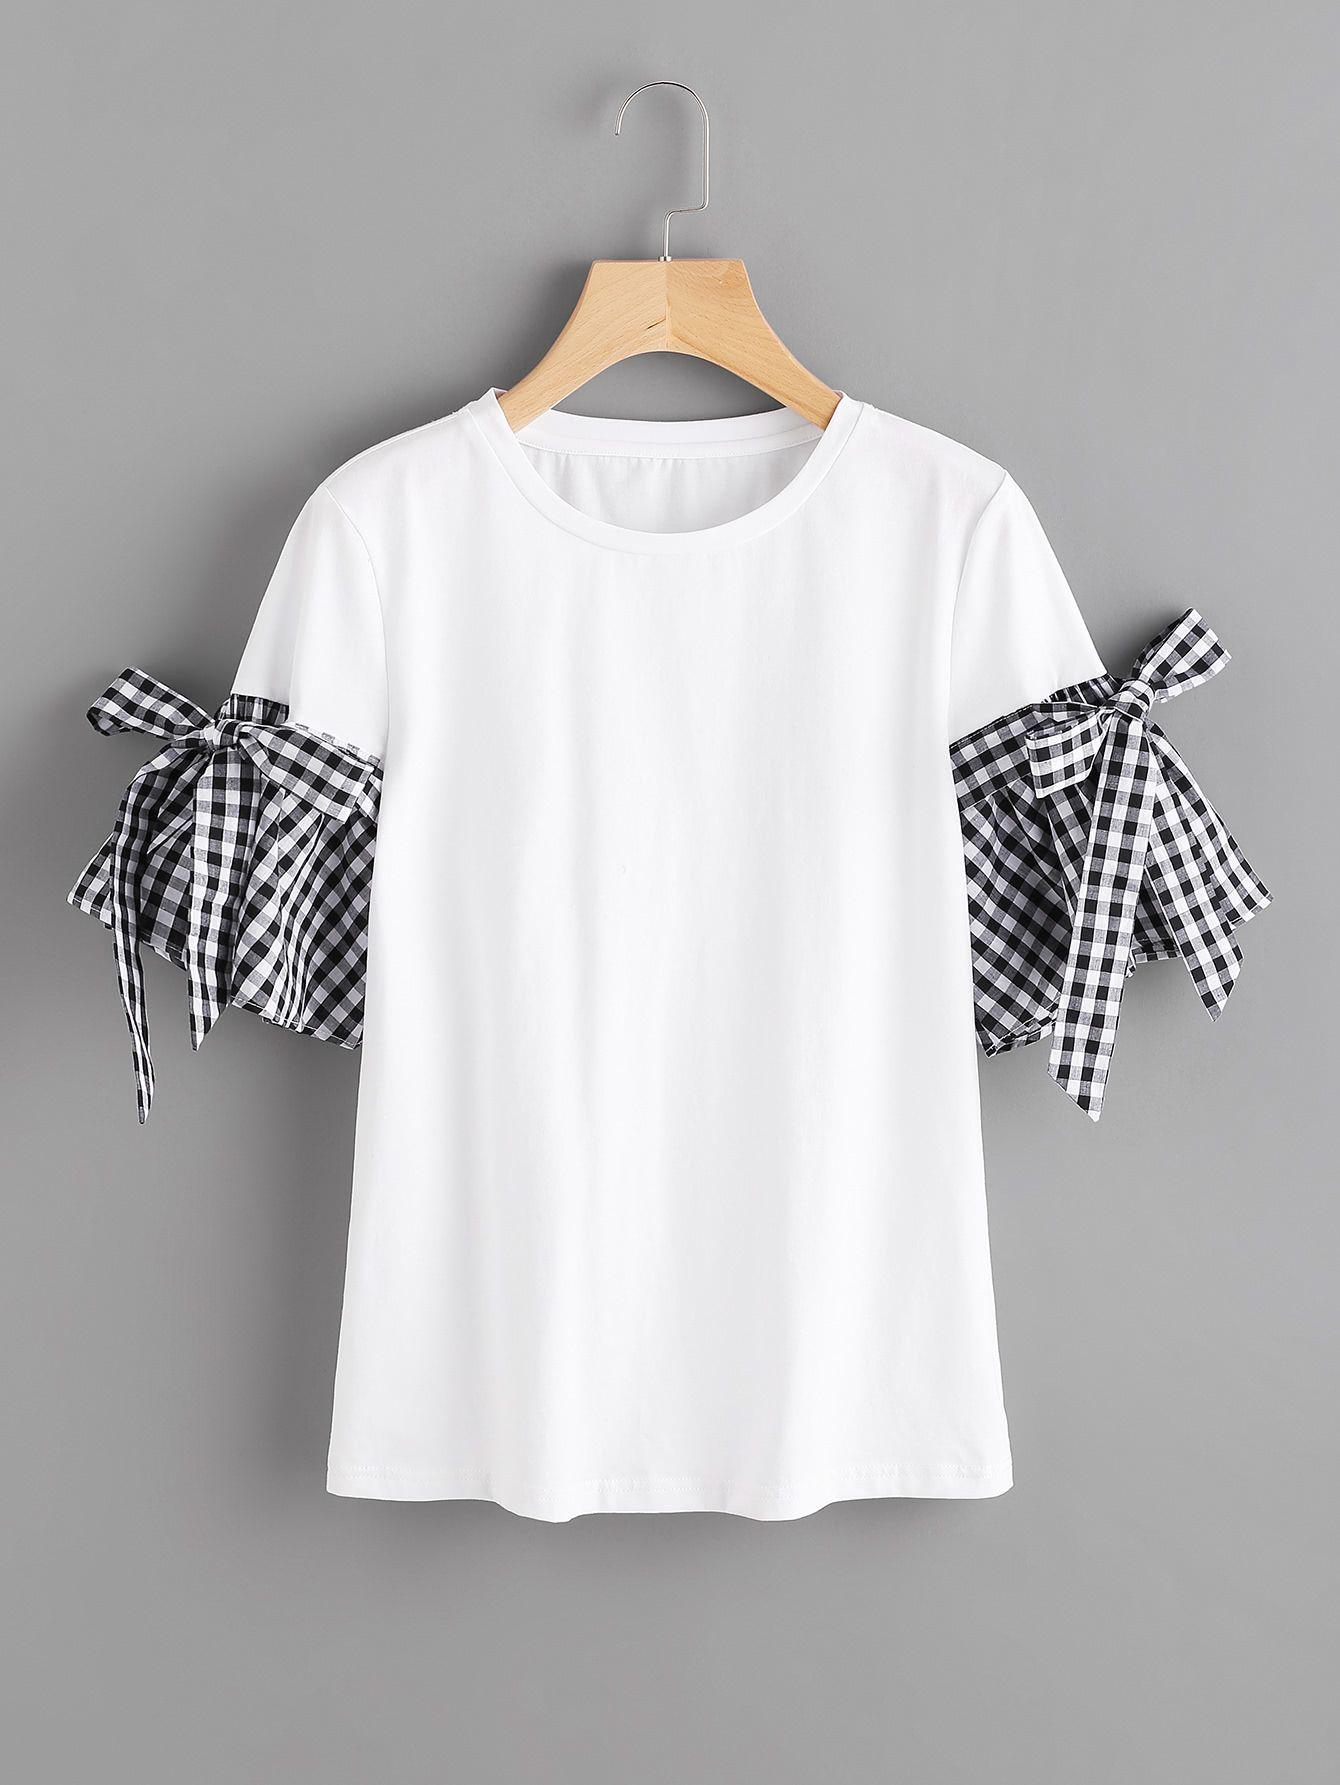 Camiseta de cuadros con detalle de lazo en 2018 | Modelos blusas ...